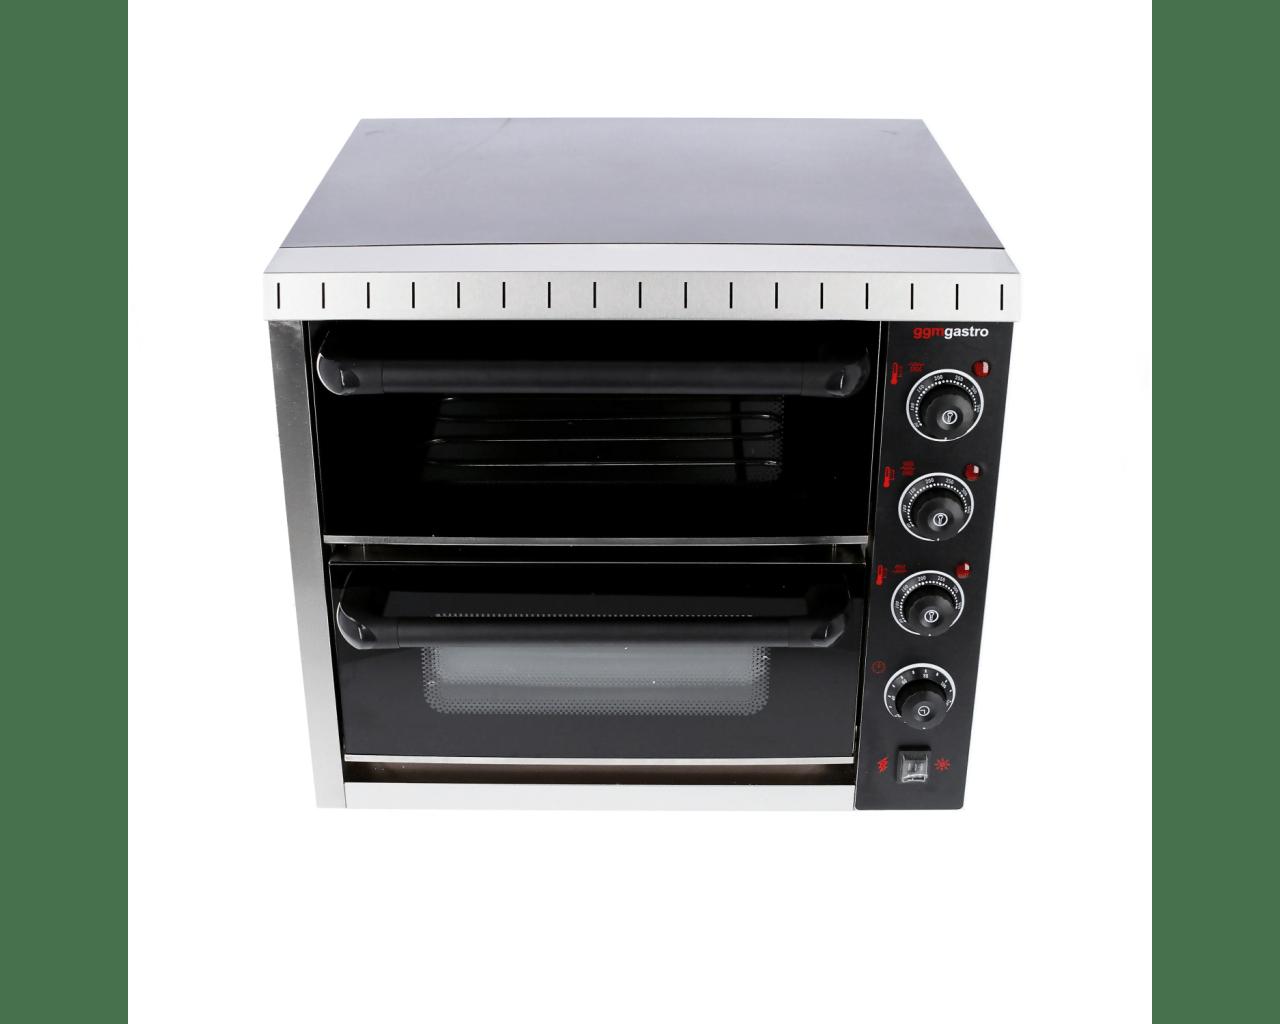 MD Black pizza oven